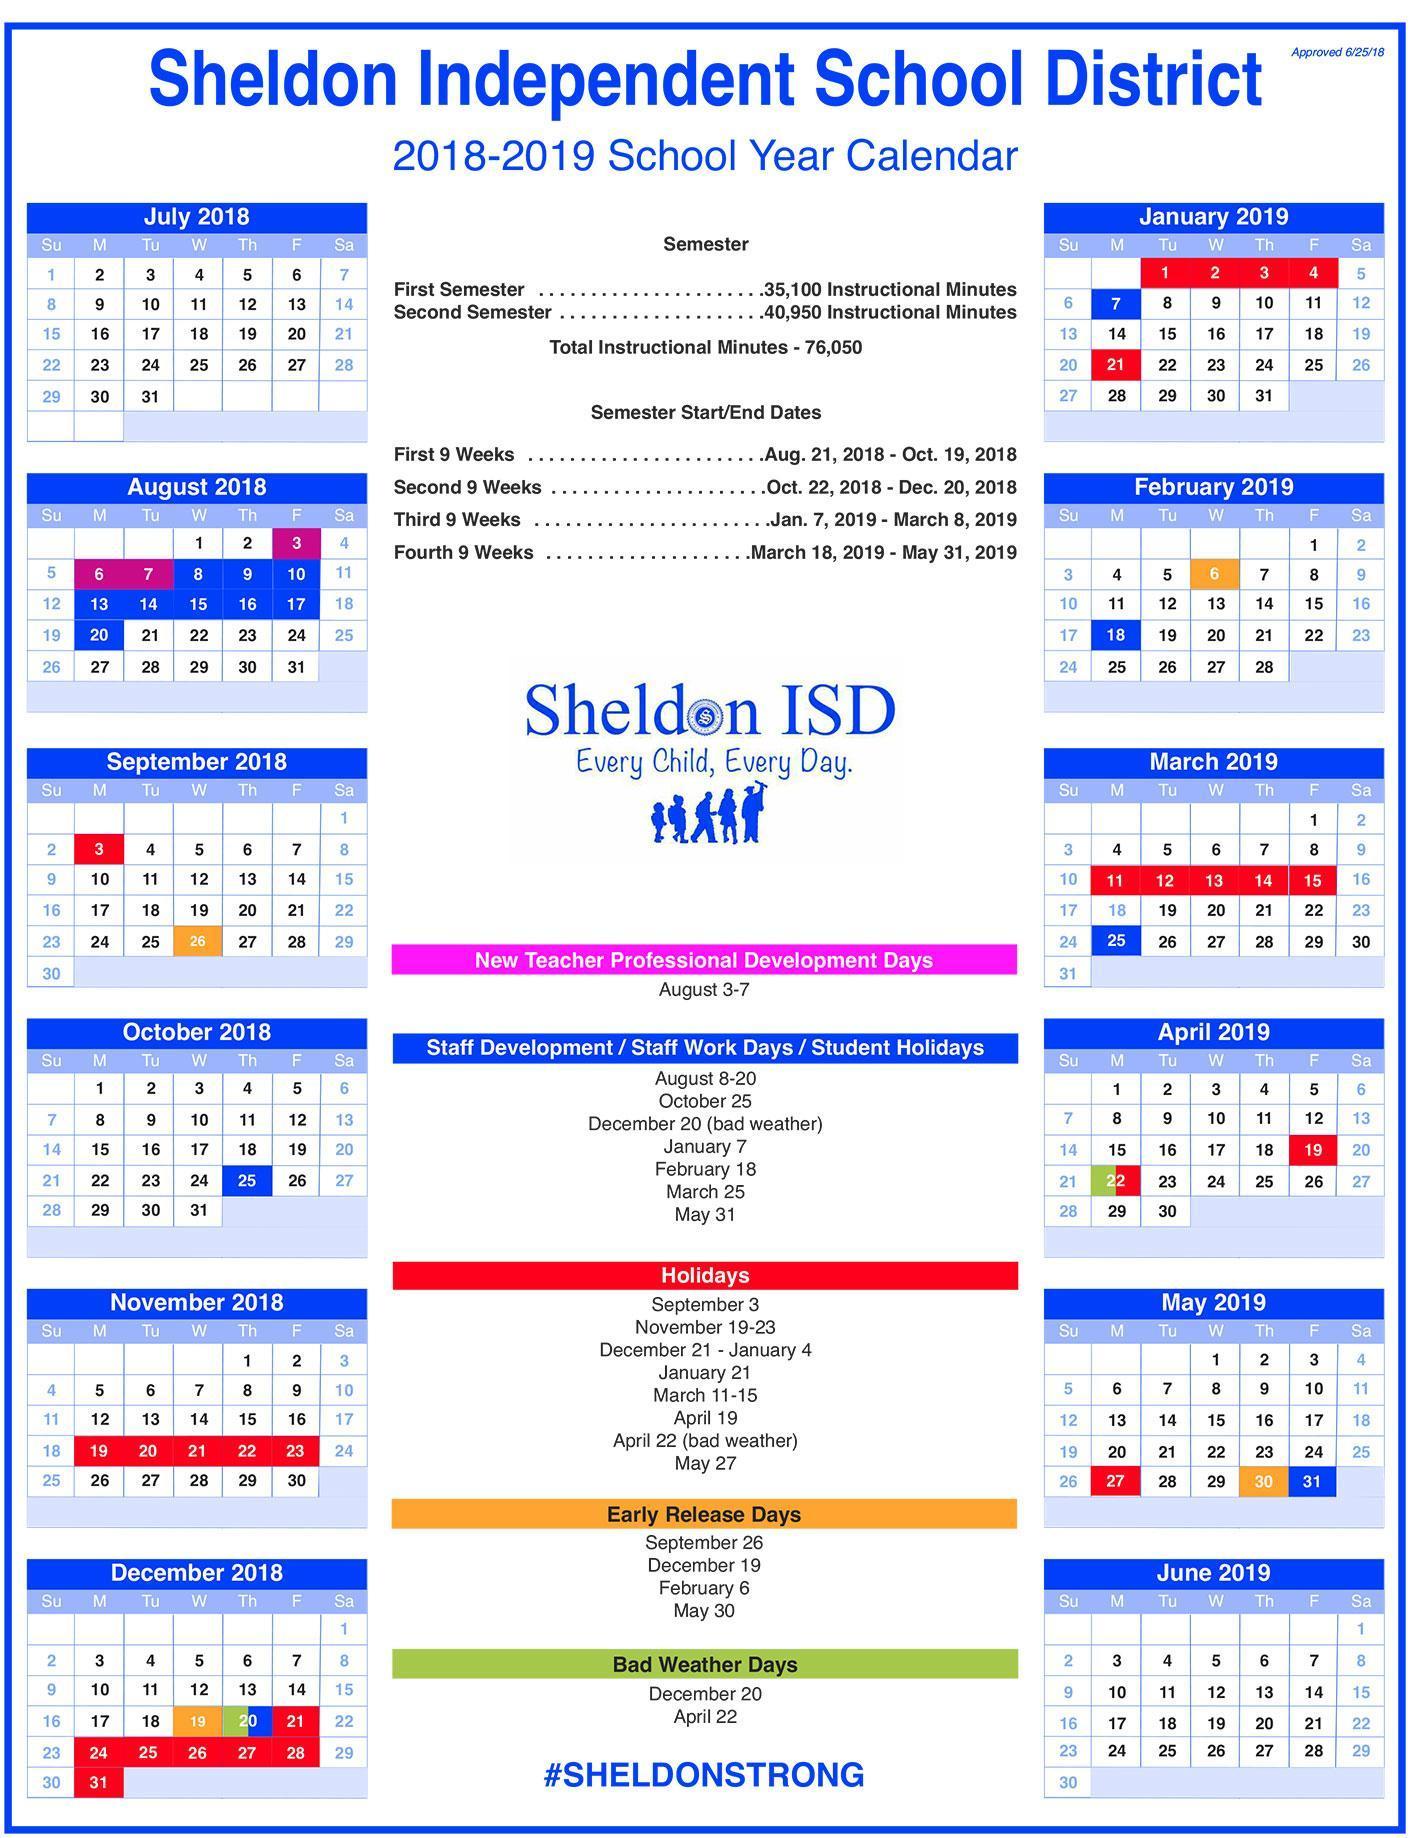 School Year Calendar thumbnail image